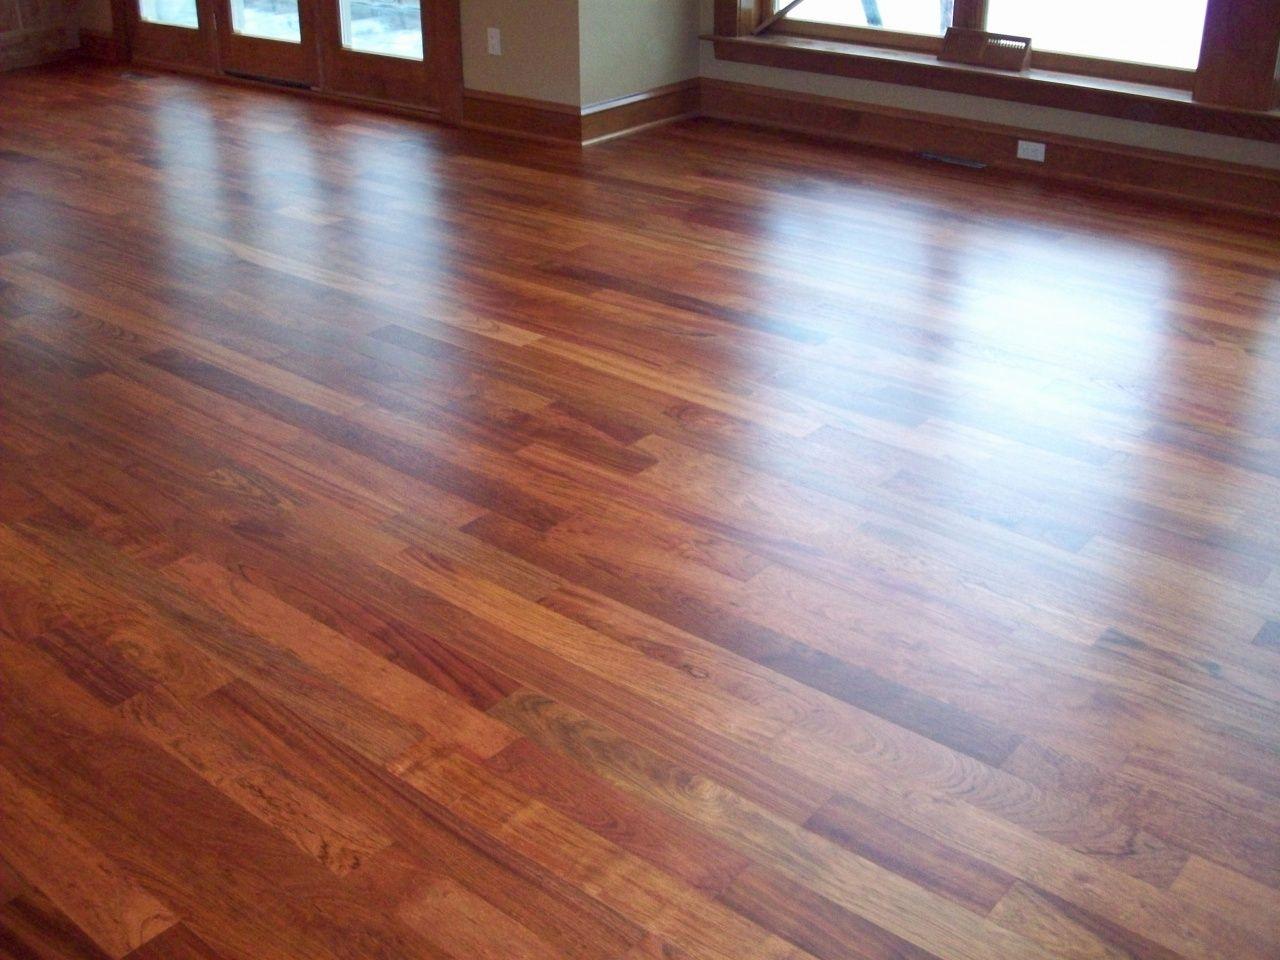 Best Prices On Hardwood Flooring in 2020 Wood laminate